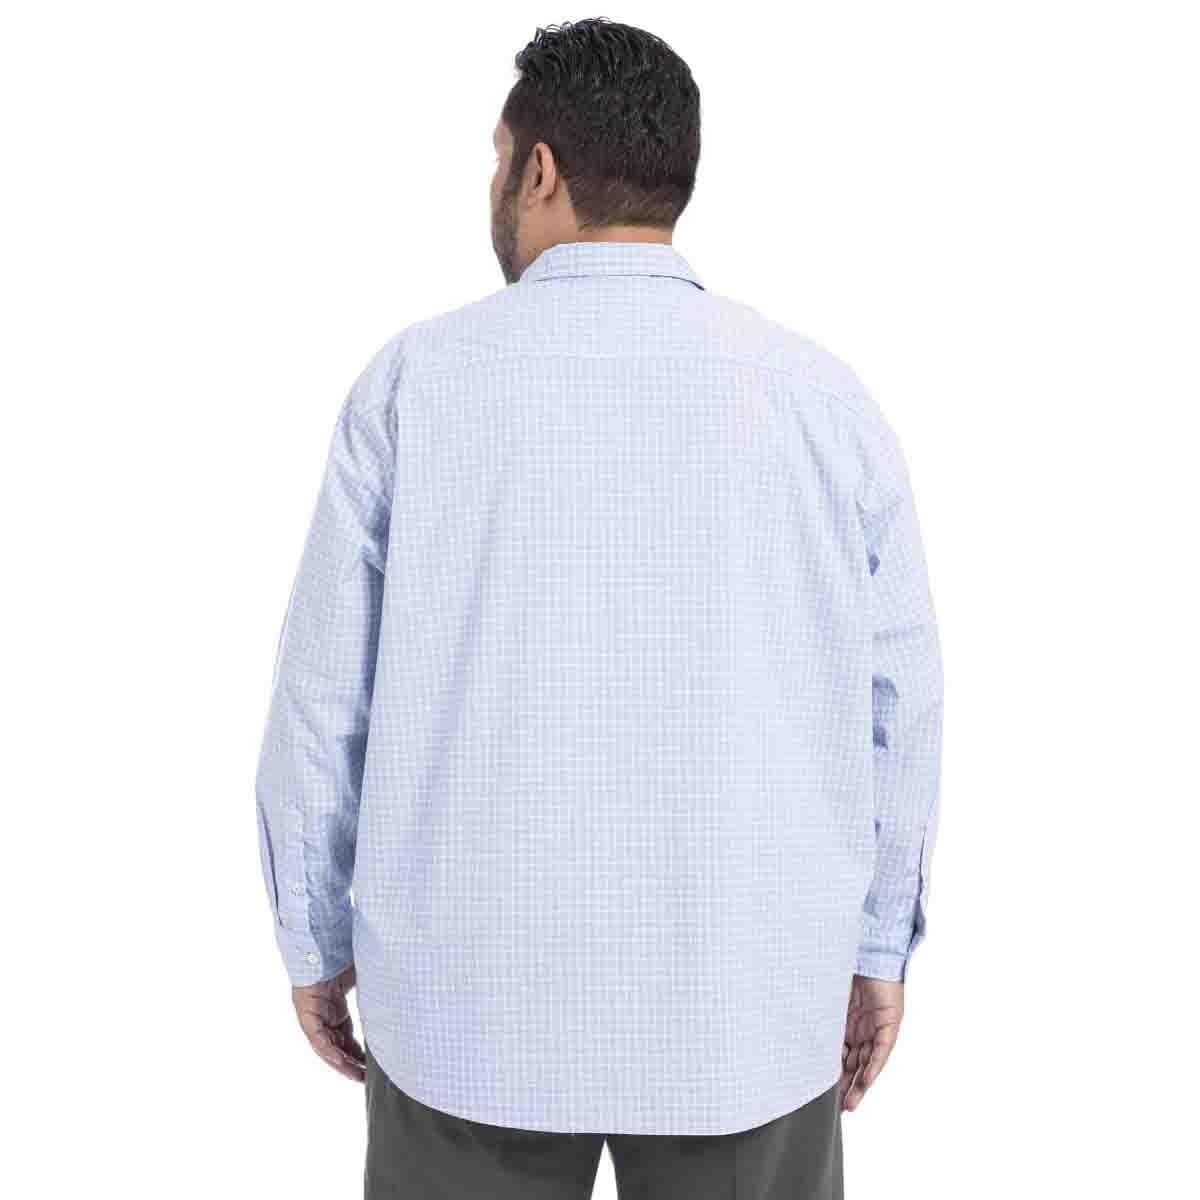 Camisa Manga Larga Azul B&t Dockers